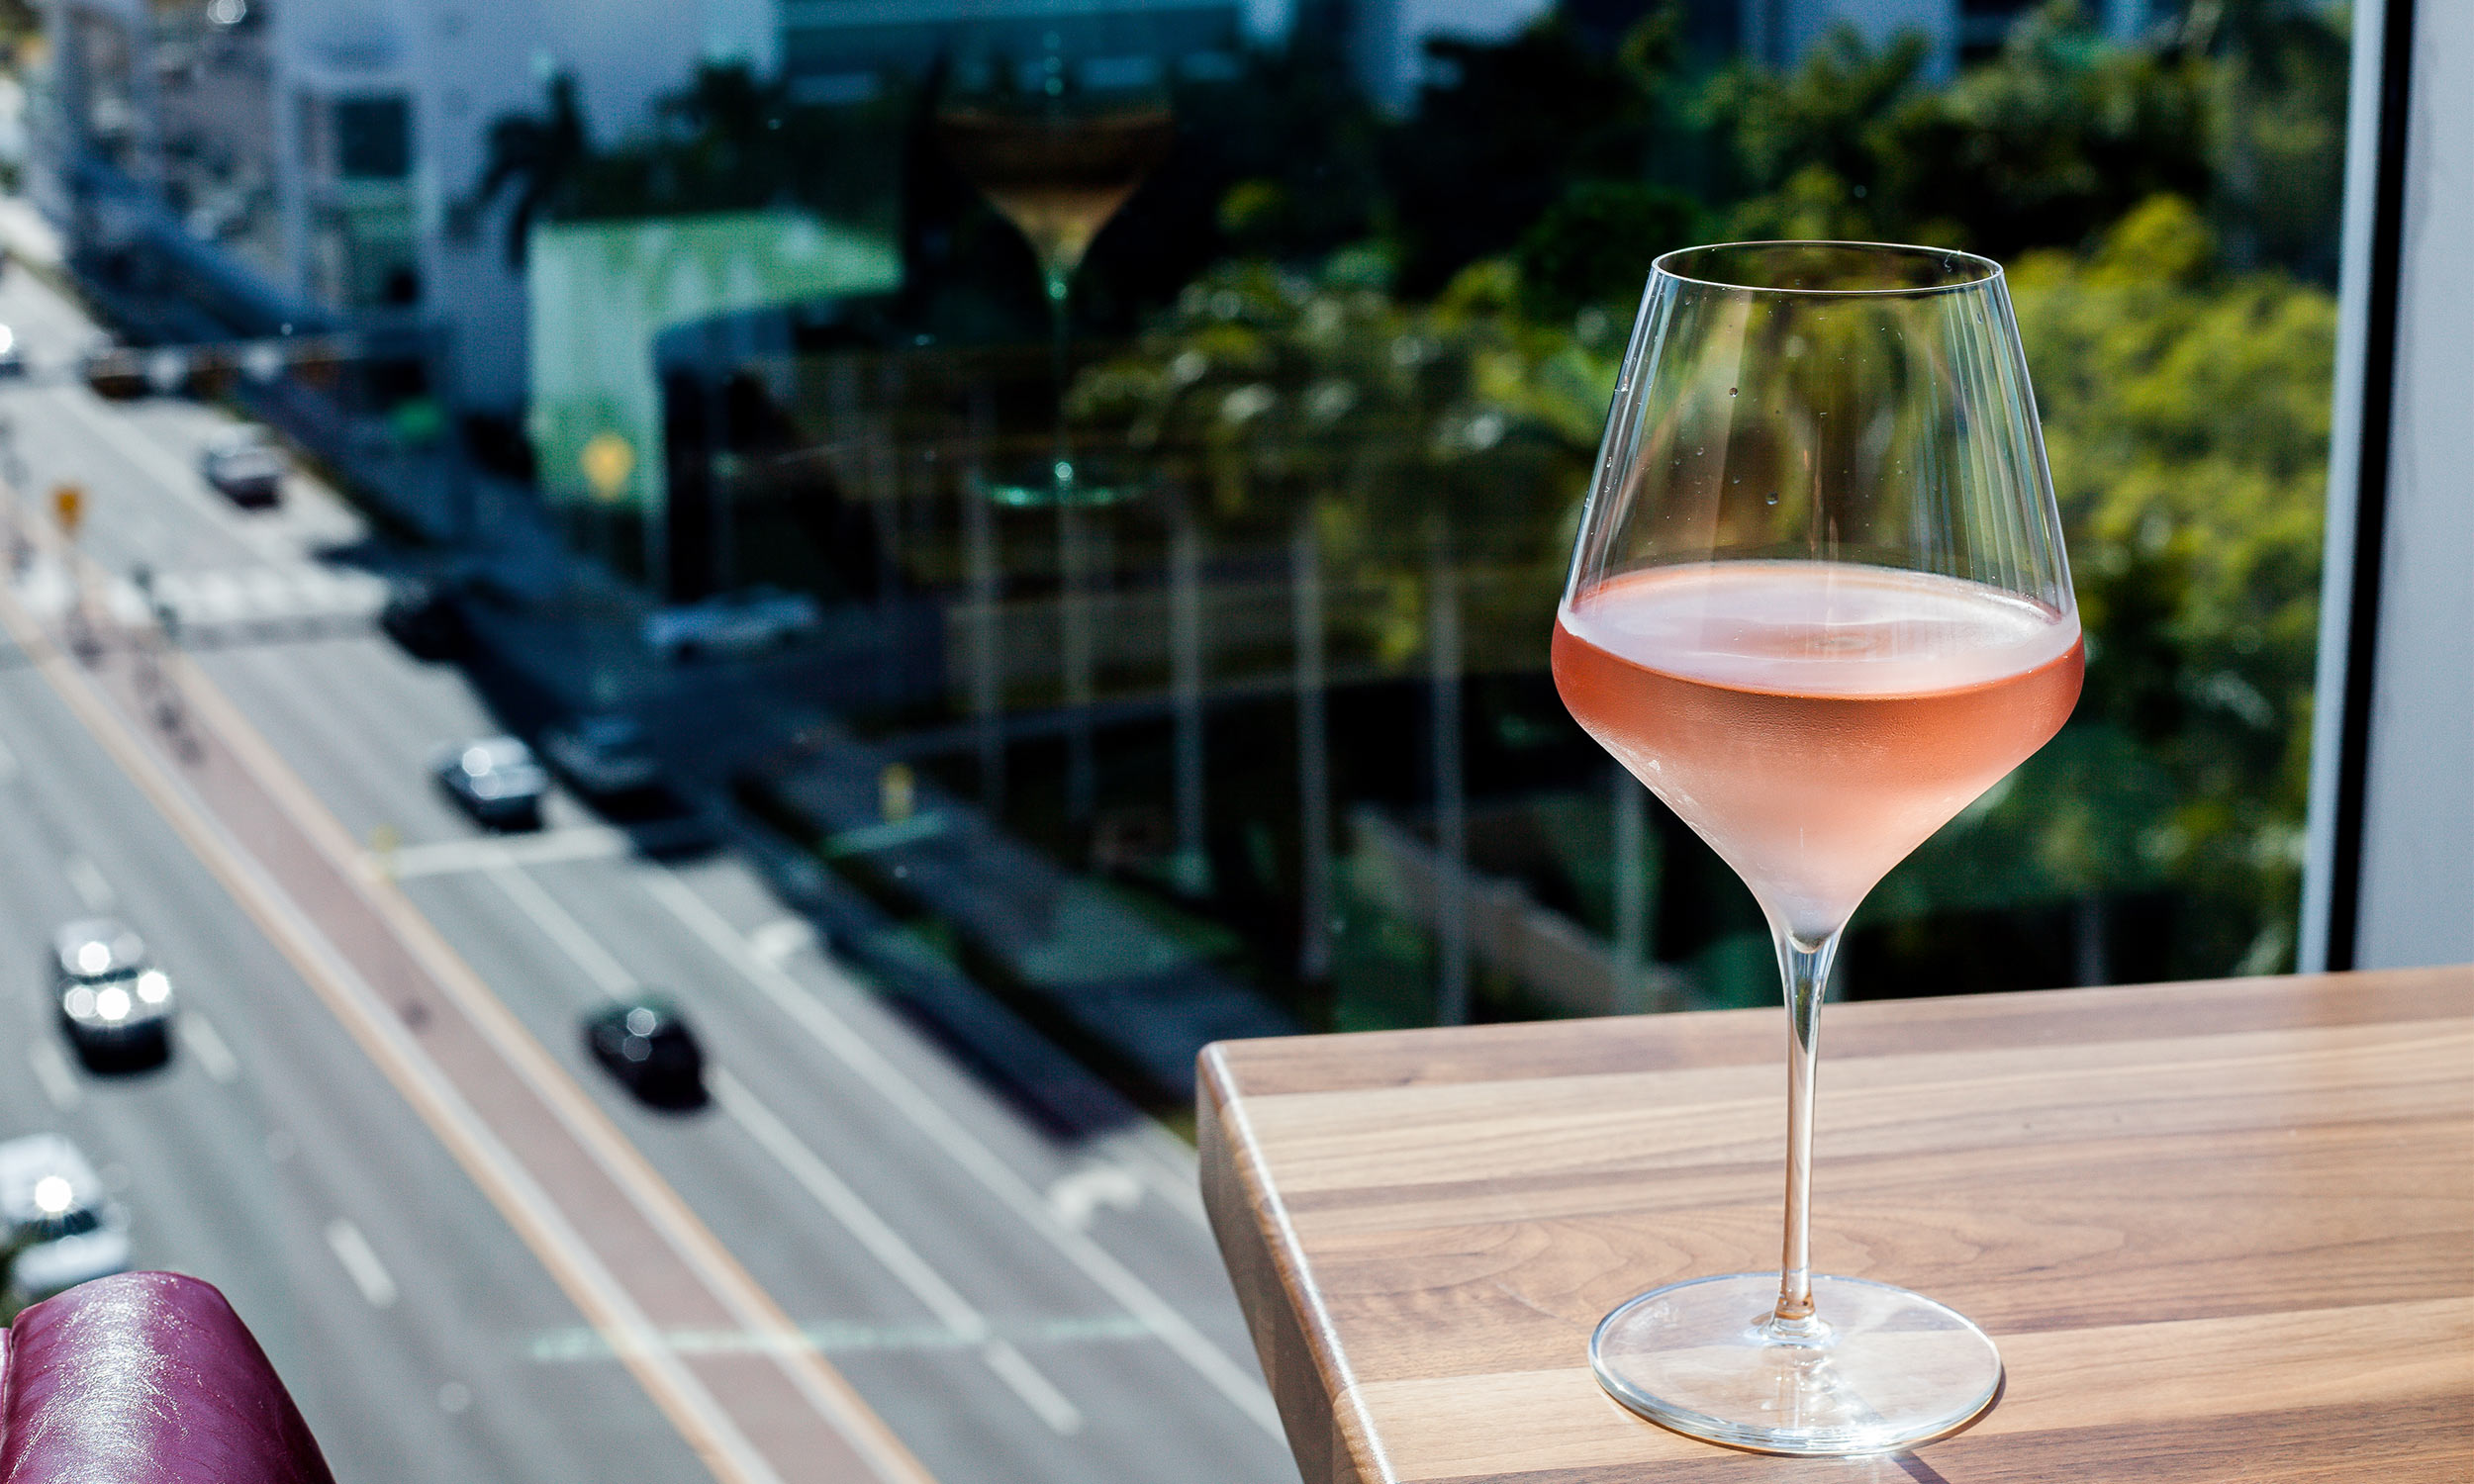 bridges-restaurant-drinks-sarasota-fl-3.jpg